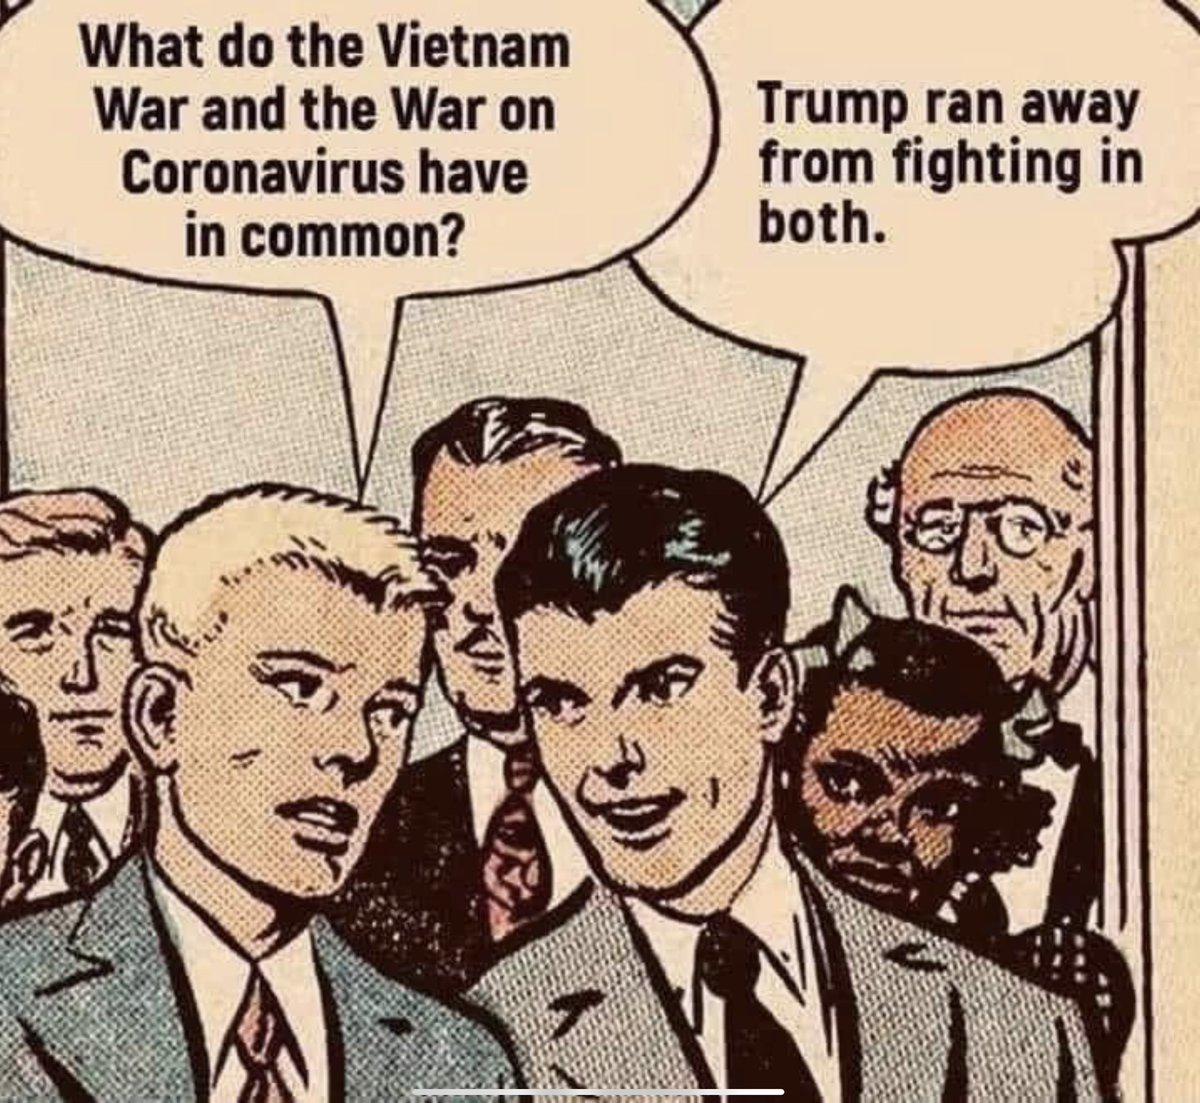 Your a weak feeble minded disgrace @realDonaldTrump